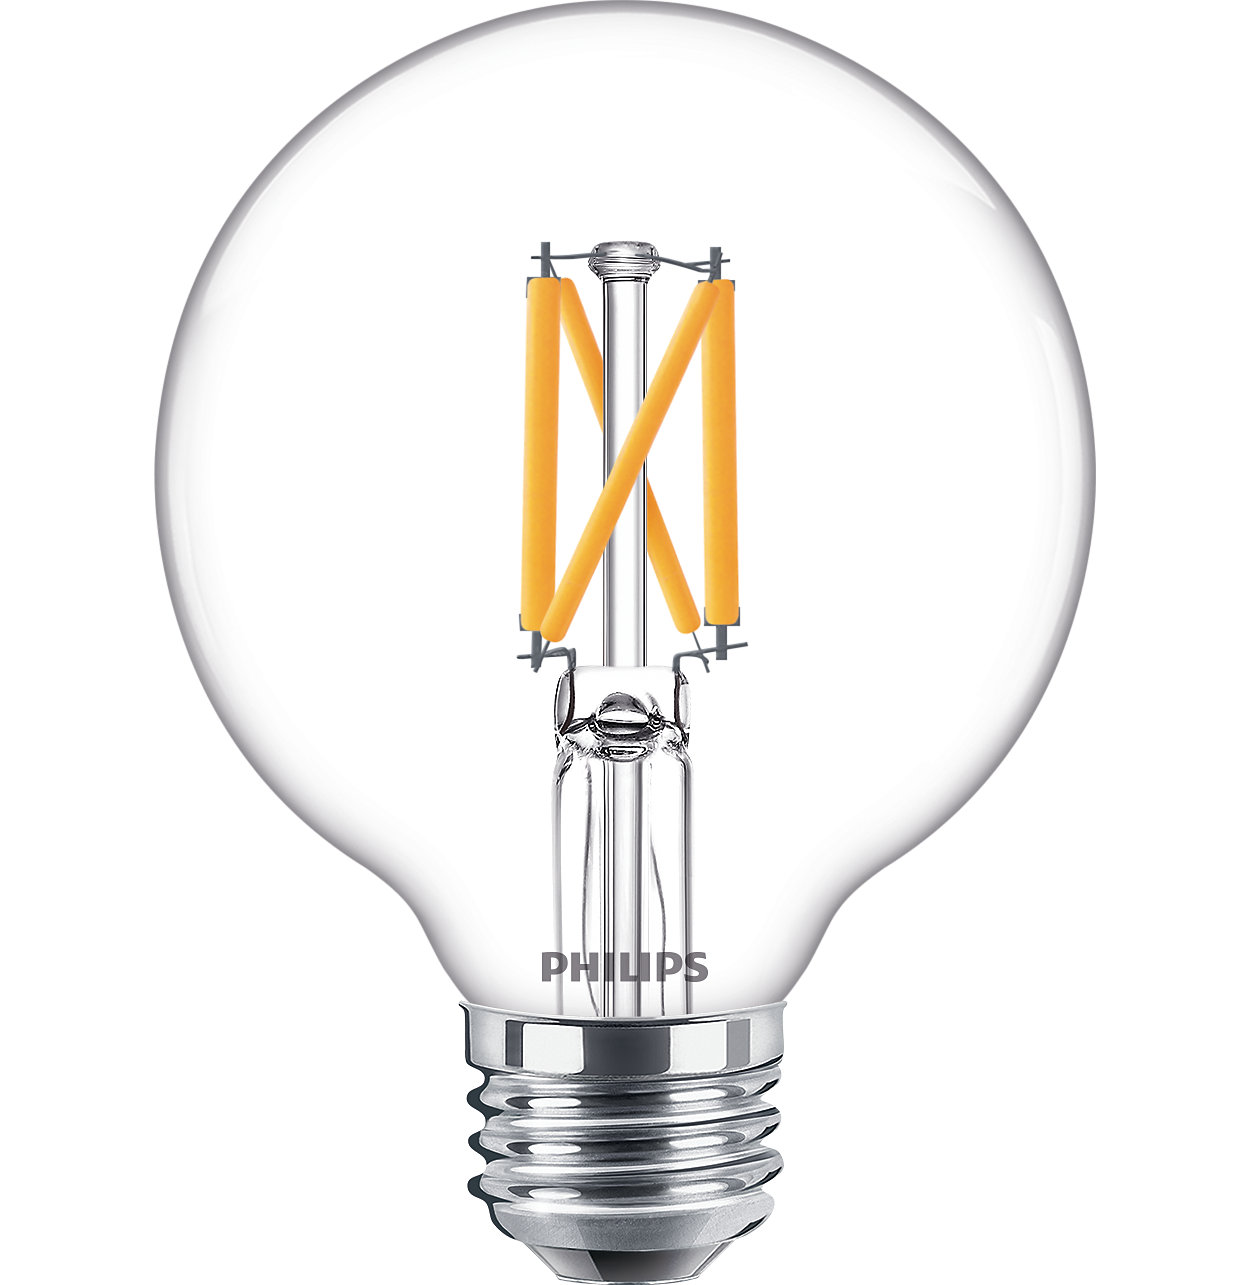 Energy saving elegance in a verstile design